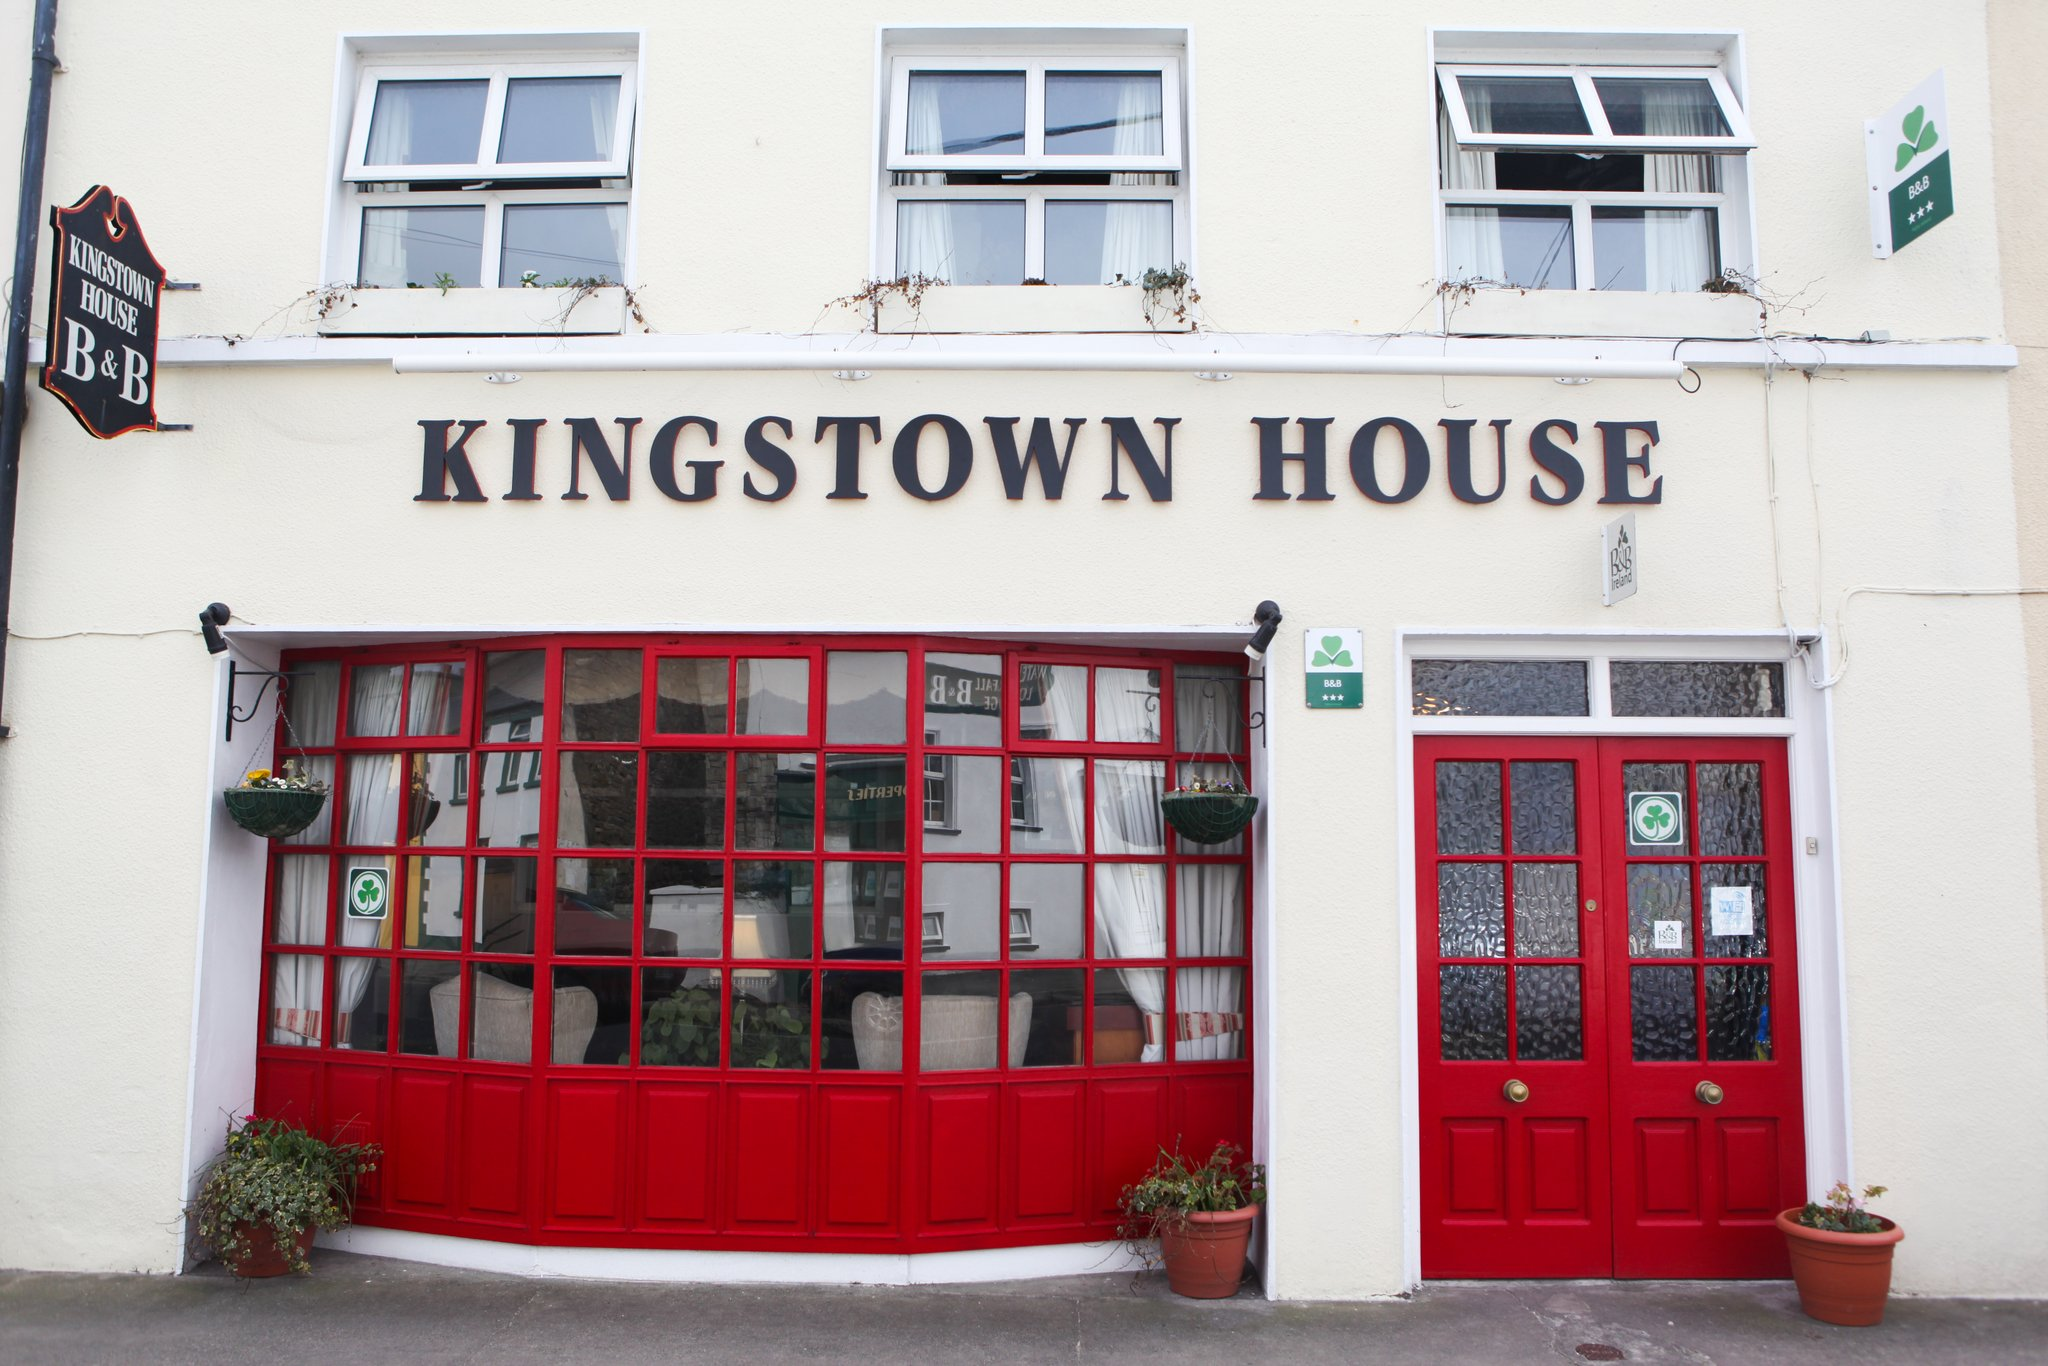 KINGSTOWN HOUSE